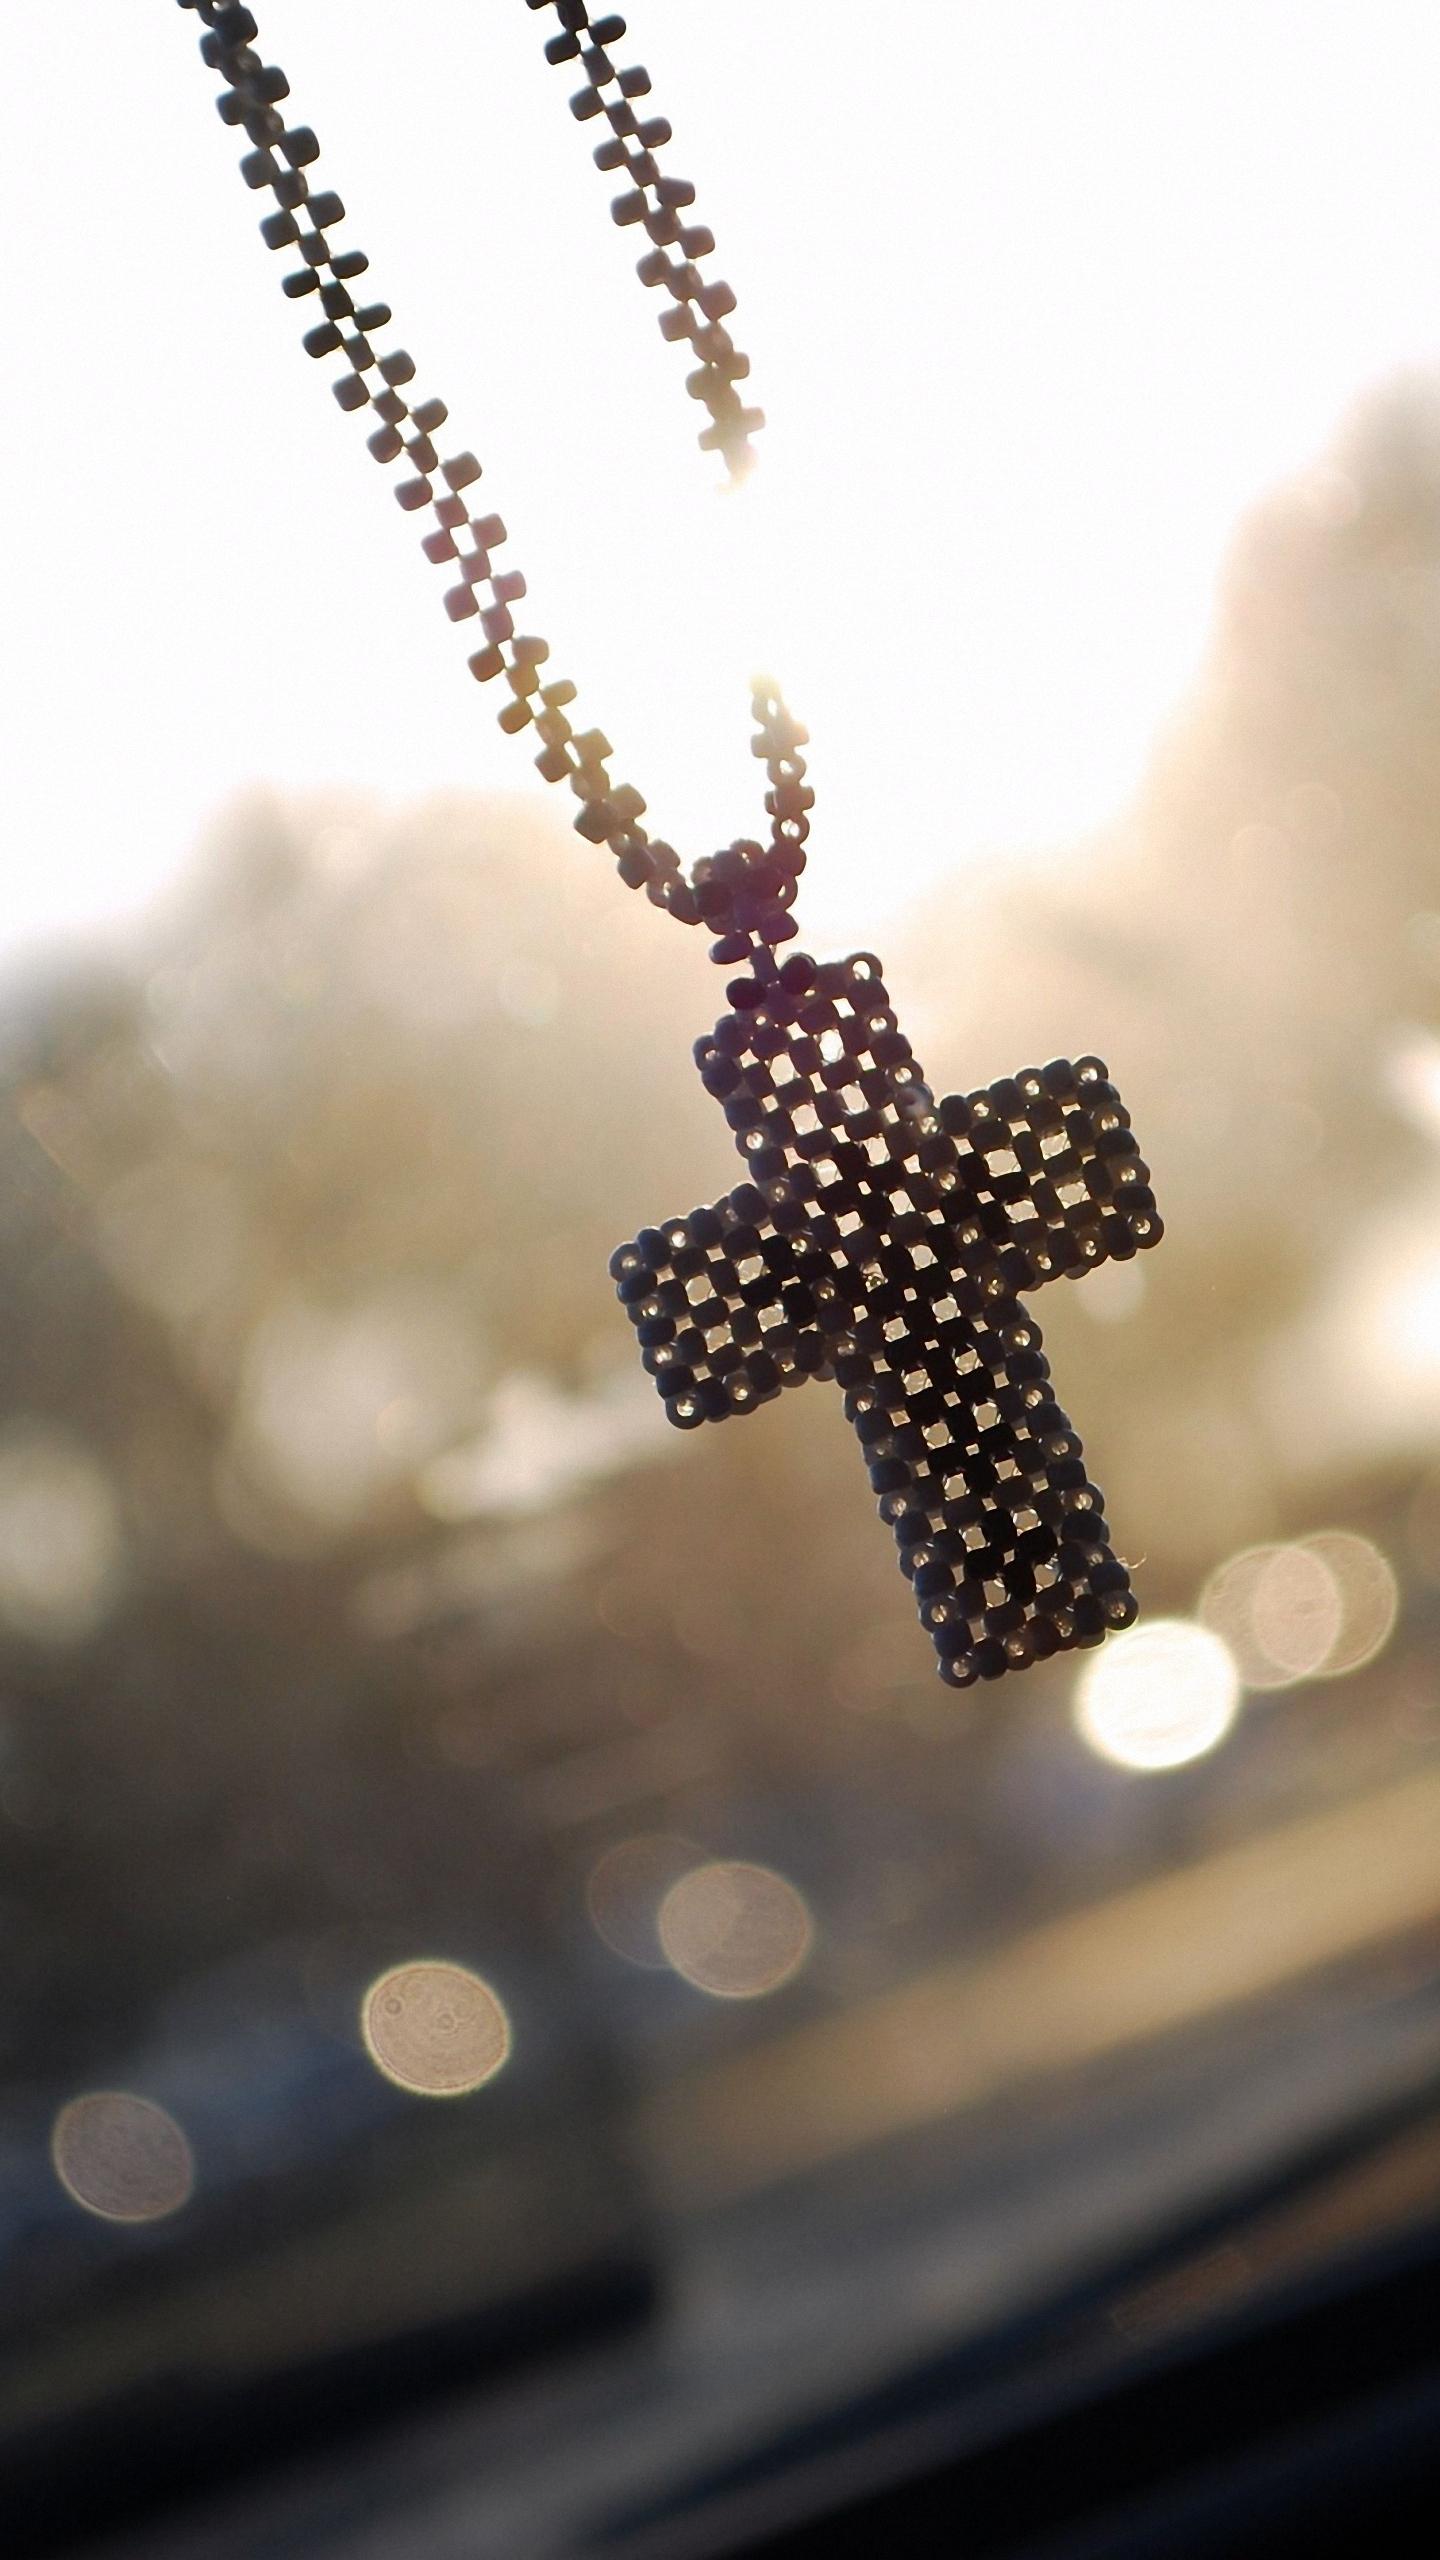 Cross With Chain Wallpaper Hd Wallpapersafari